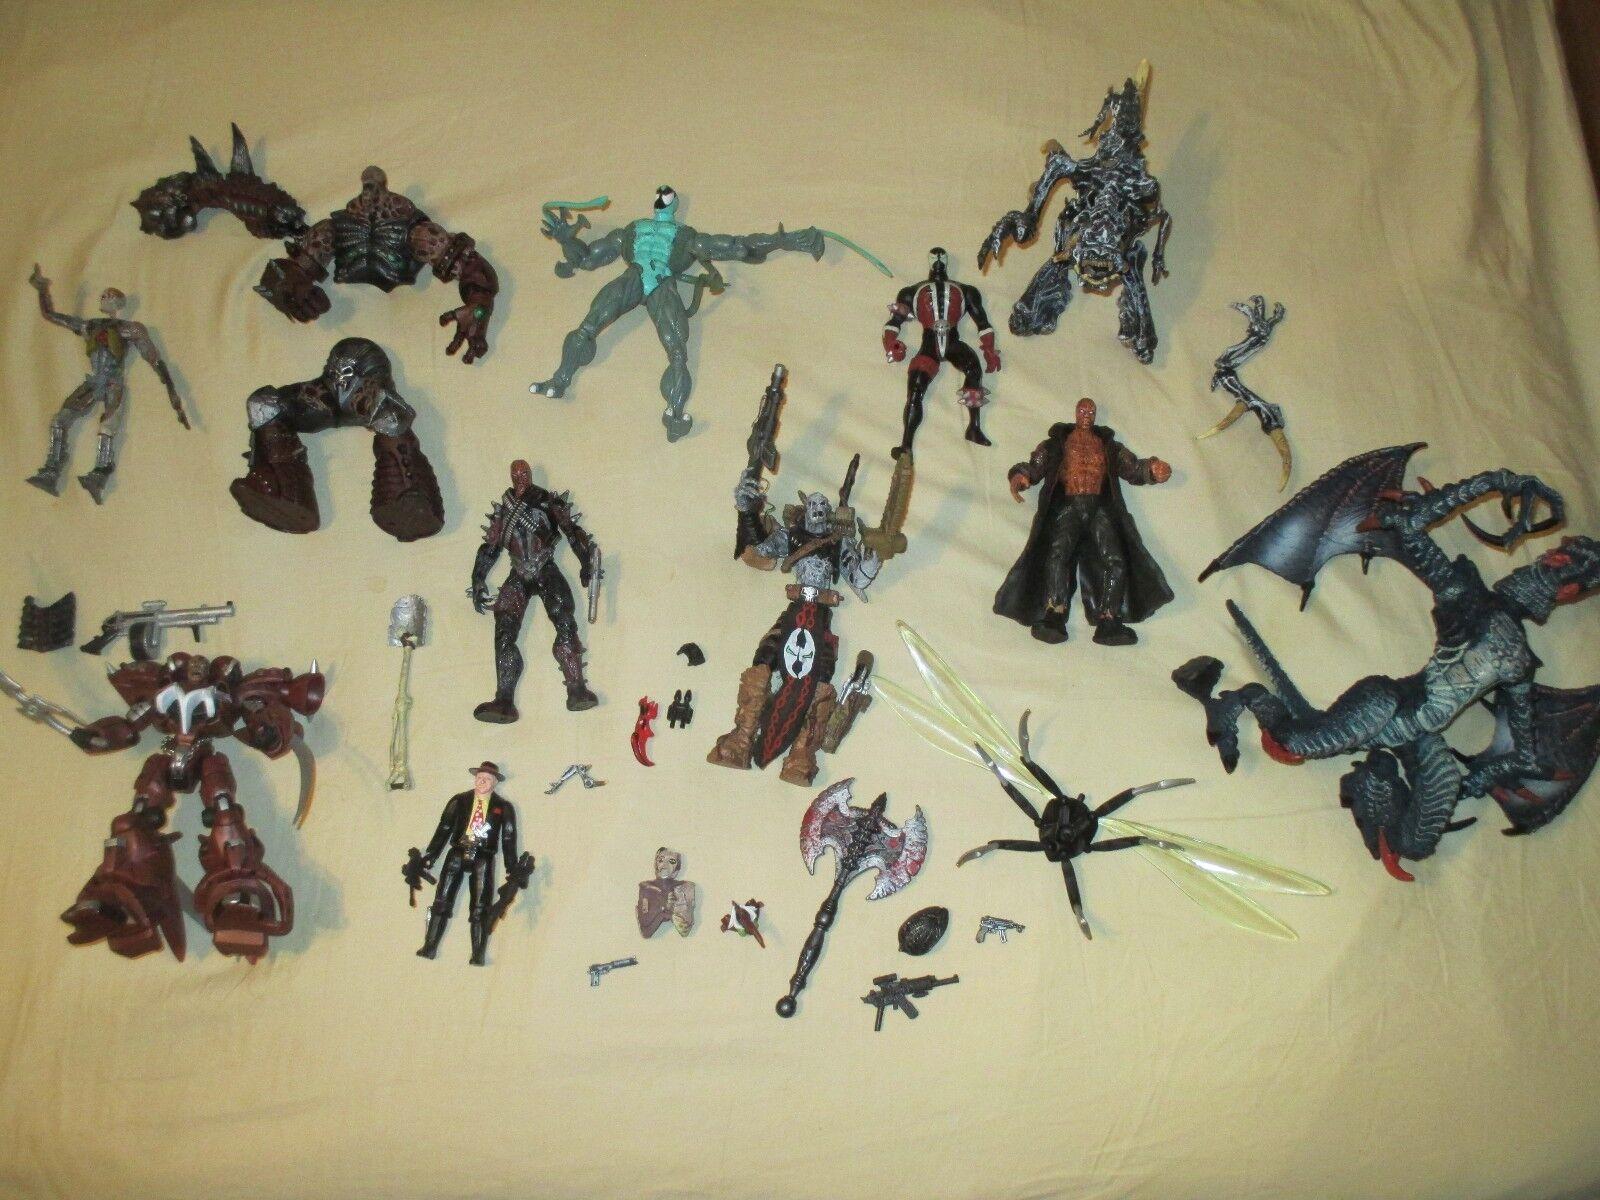 Lot de 10  SPAWN Todd McFarlane action figures SPAWN DEMONS Monstres  magasin de gros